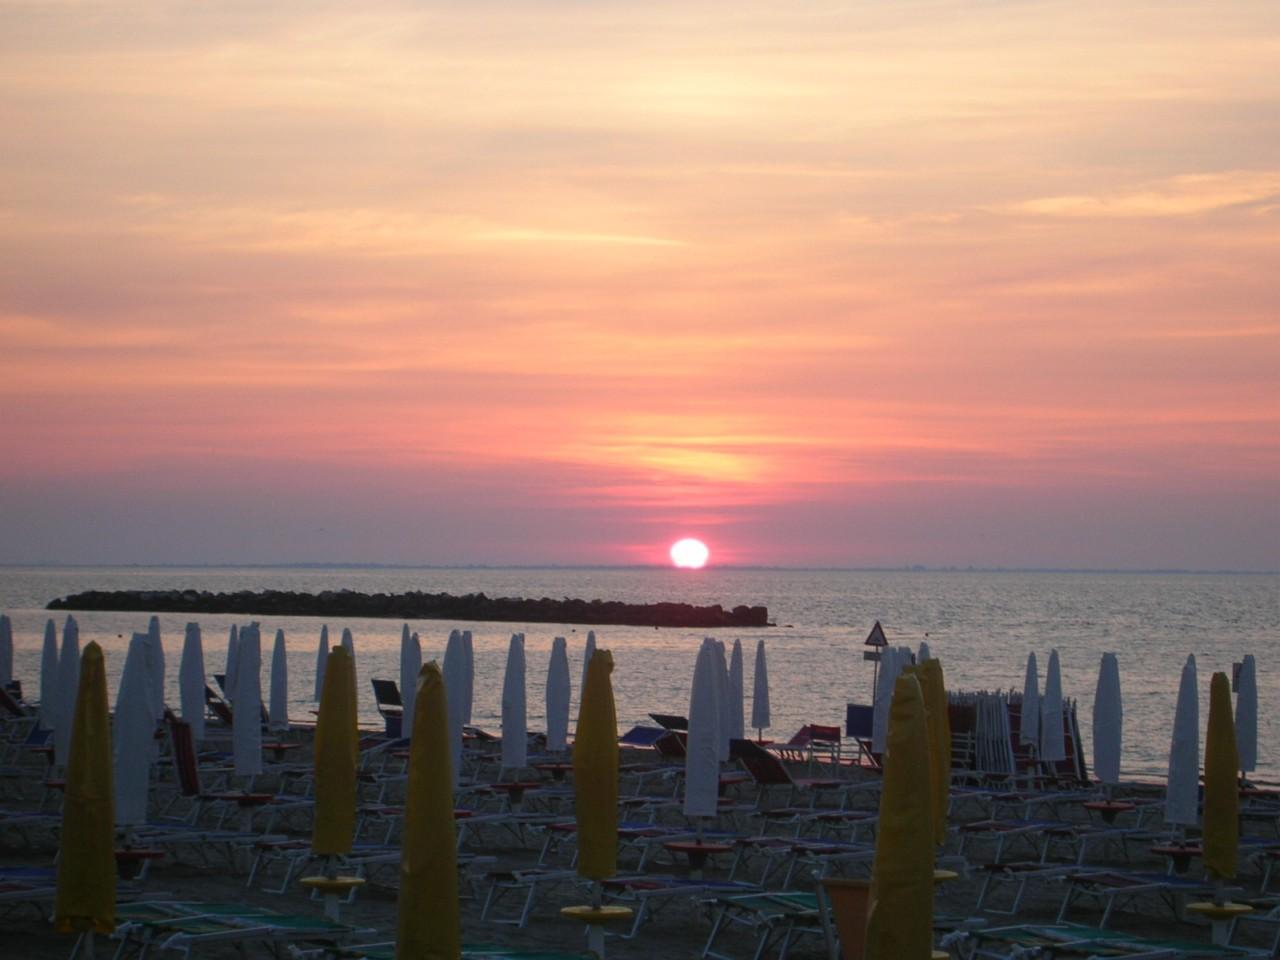 Ferienwohnung Barca B1 (424665), Lido delle Nazioni, Adriaküste (Emilia-Romagna), Emilia-Romagna, Italien, Bild 23